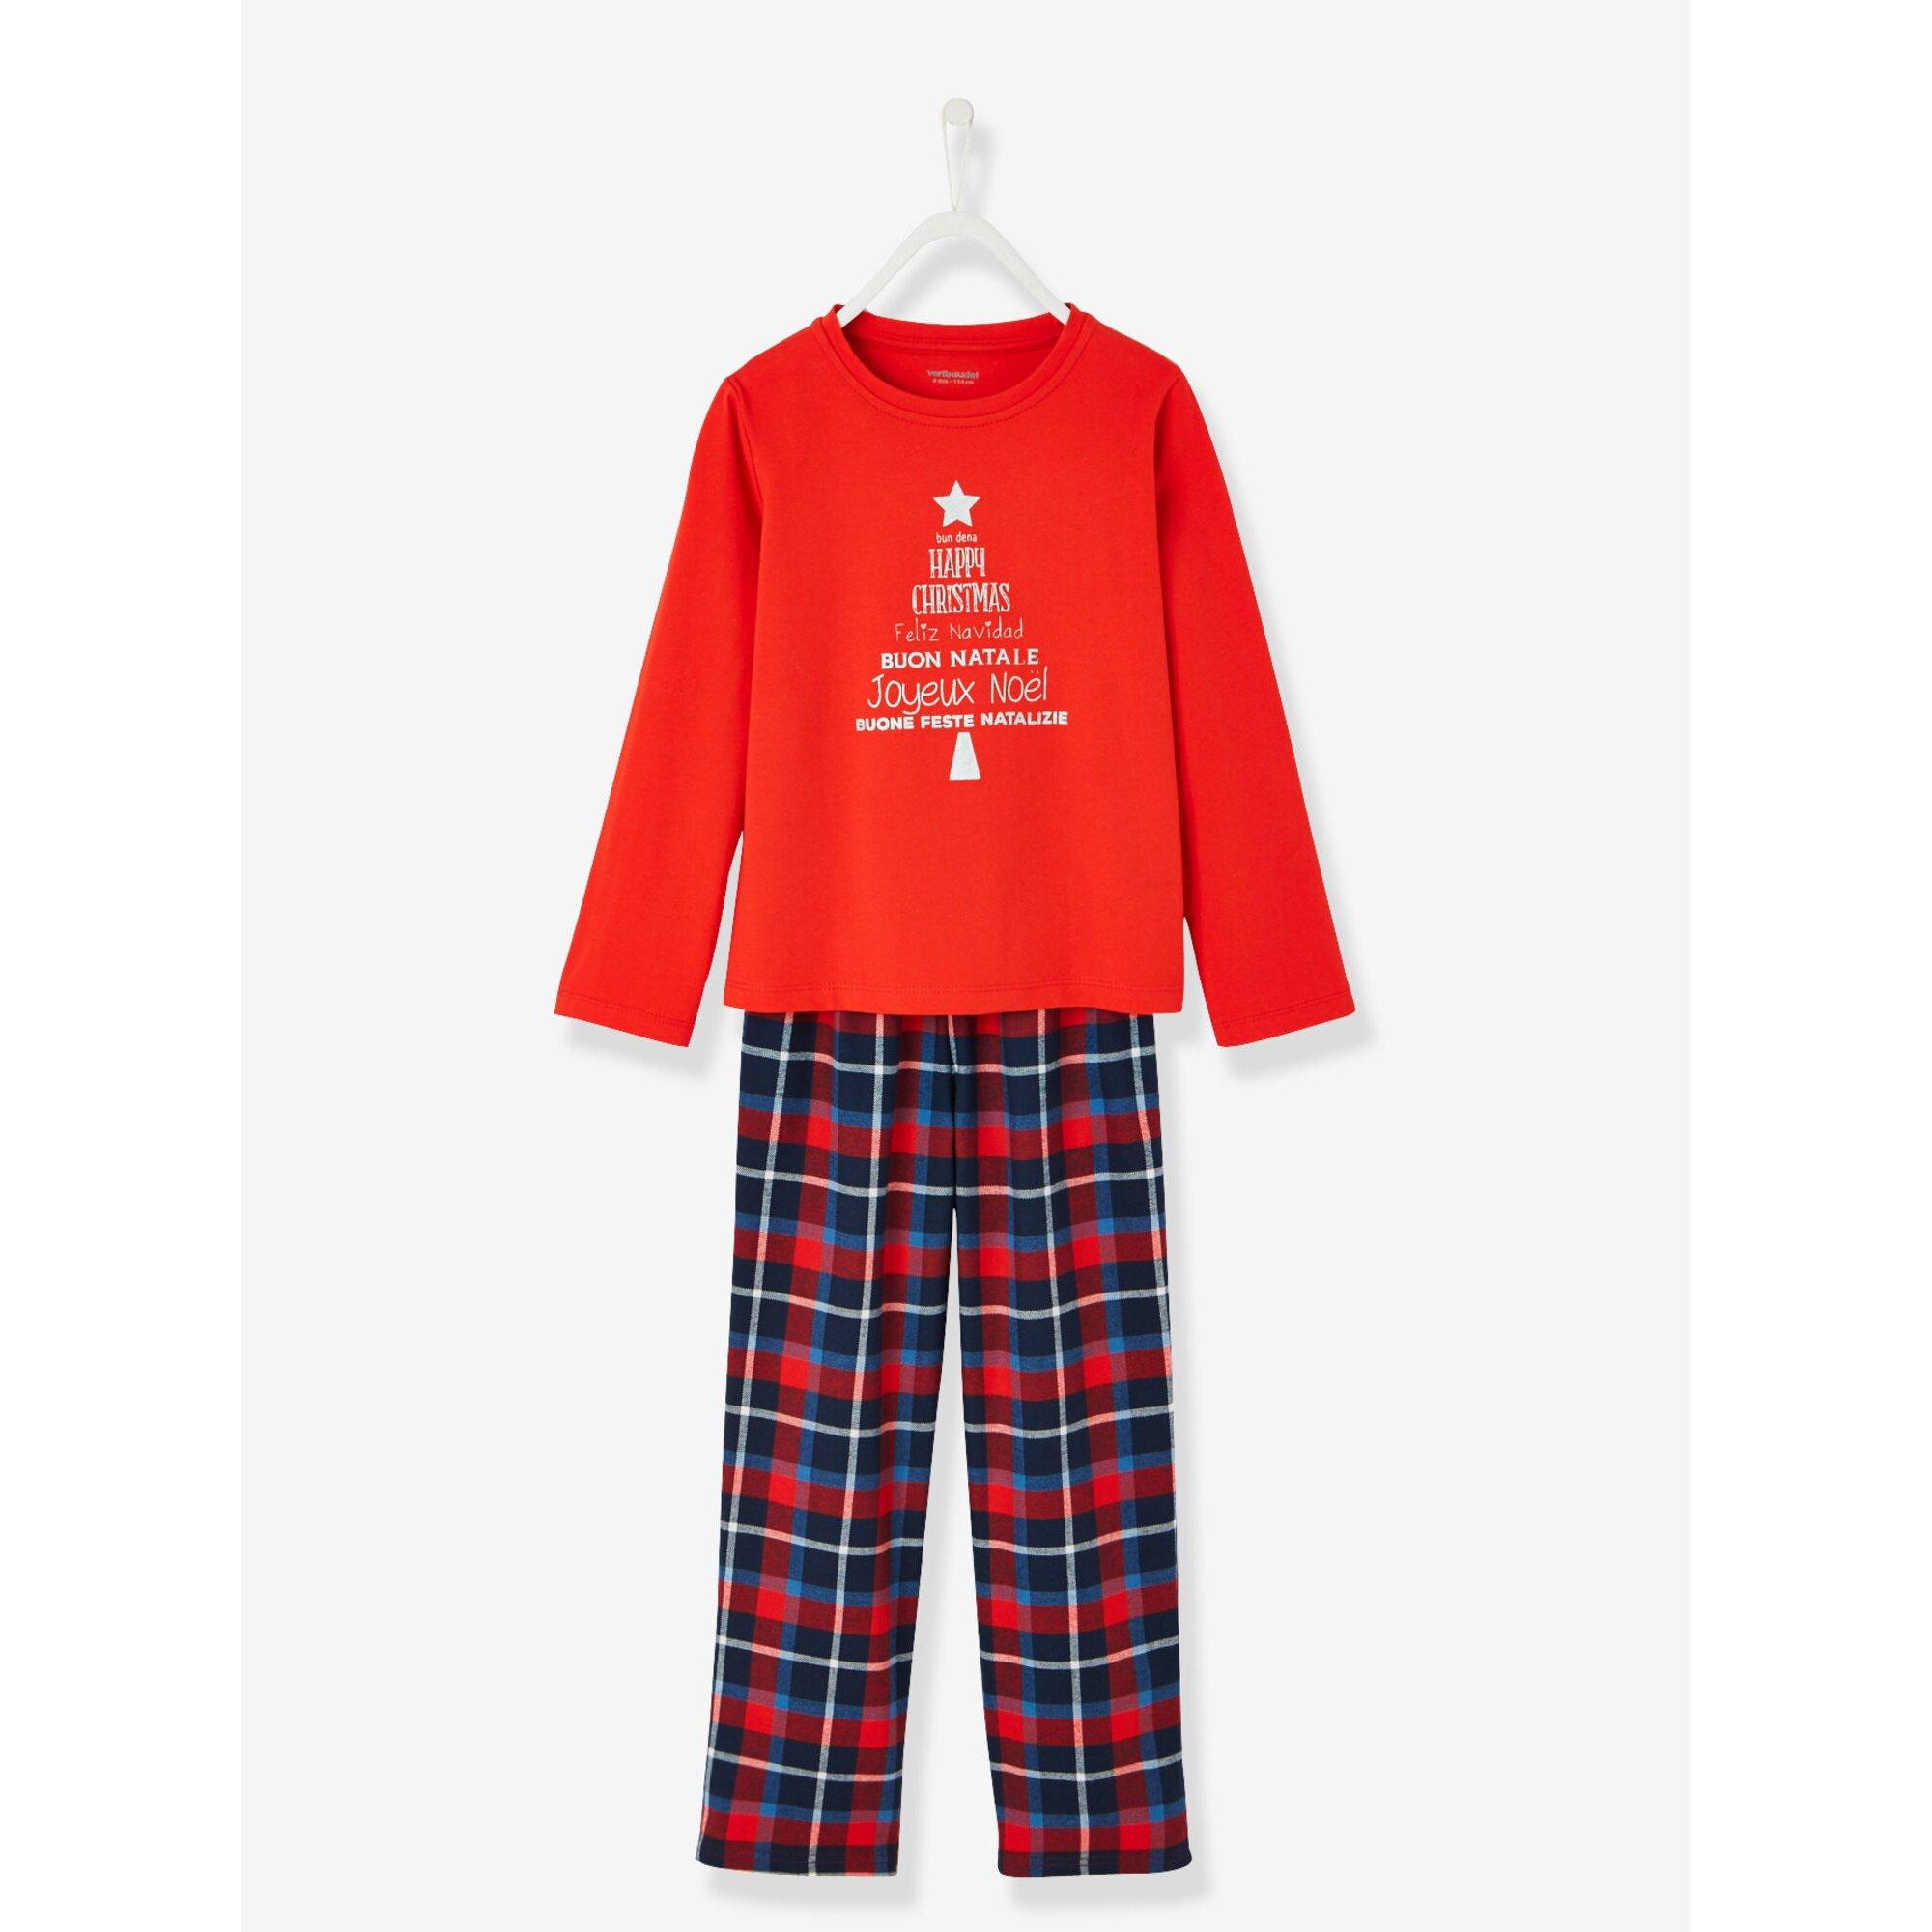 vertbaudet-warmer-jungenpyjama, 22.99 EUR @ babywalz-de